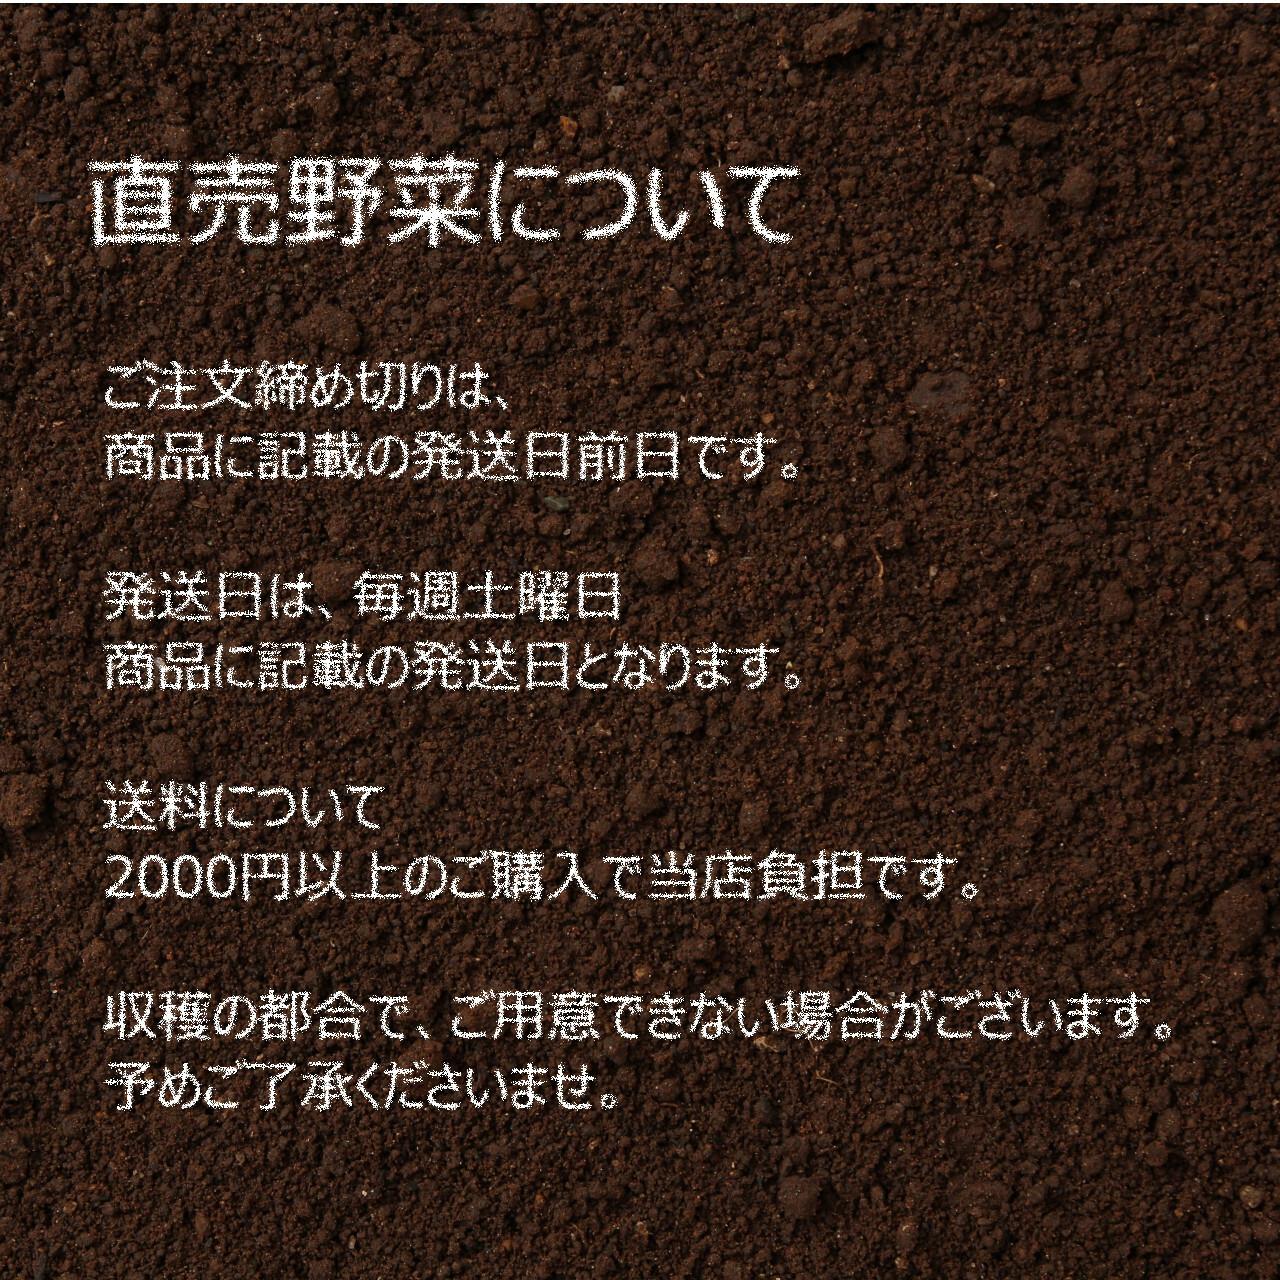 新鮮な秋野菜 : 食用菊 約150g 11月の朝採り直売野菜 11月7日発送予定